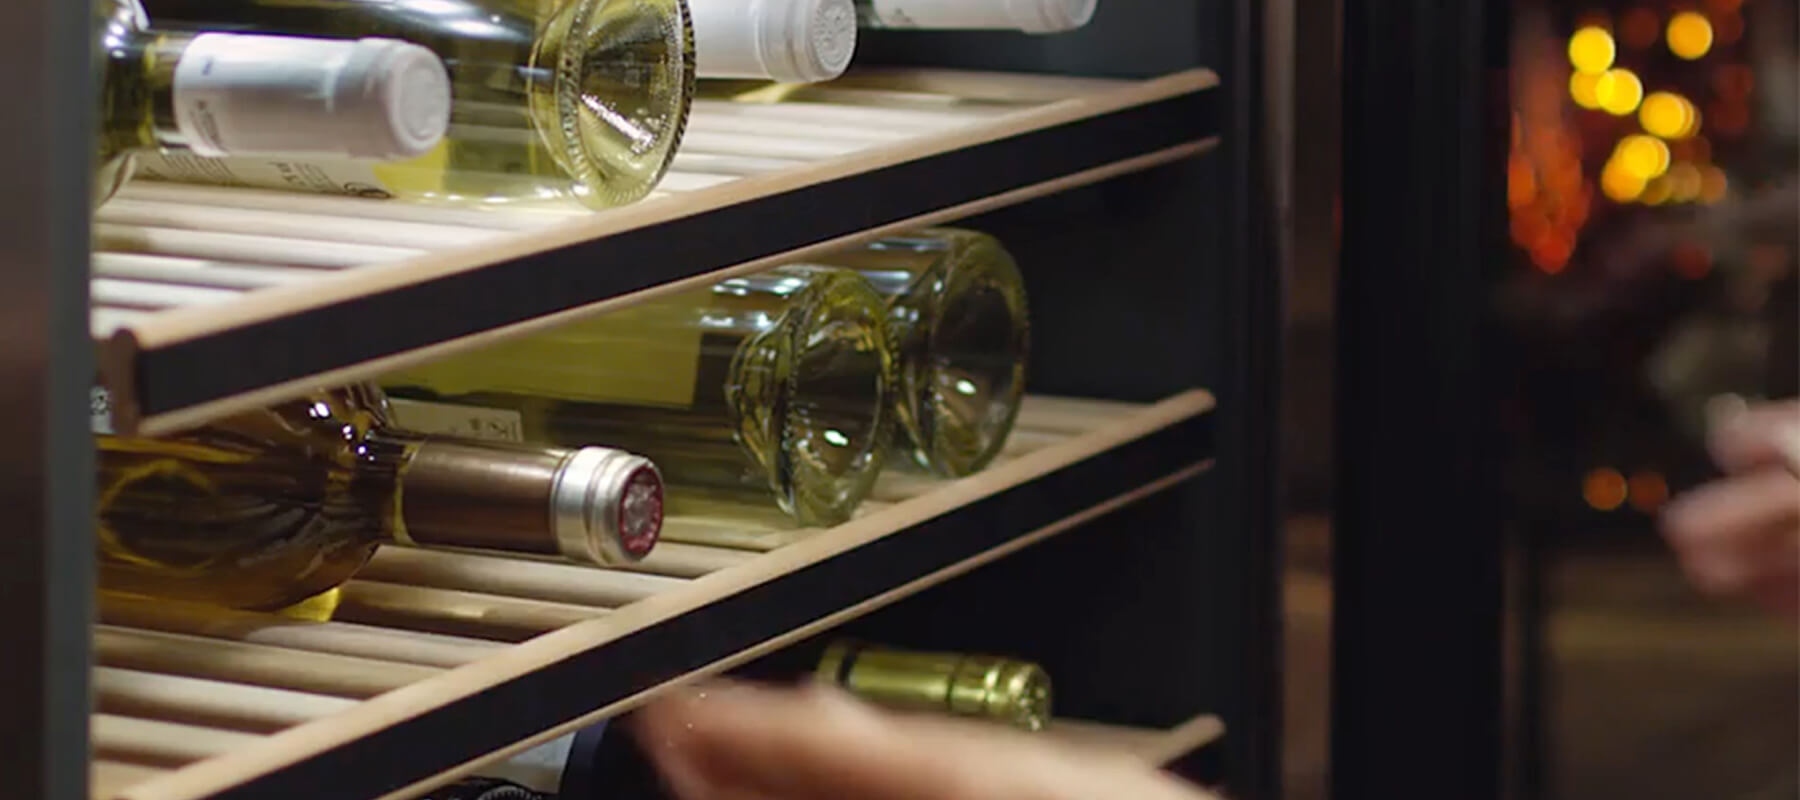 Built in Wine Refrigerator Undercounter La Costa   Built-in Refrigerator Repair